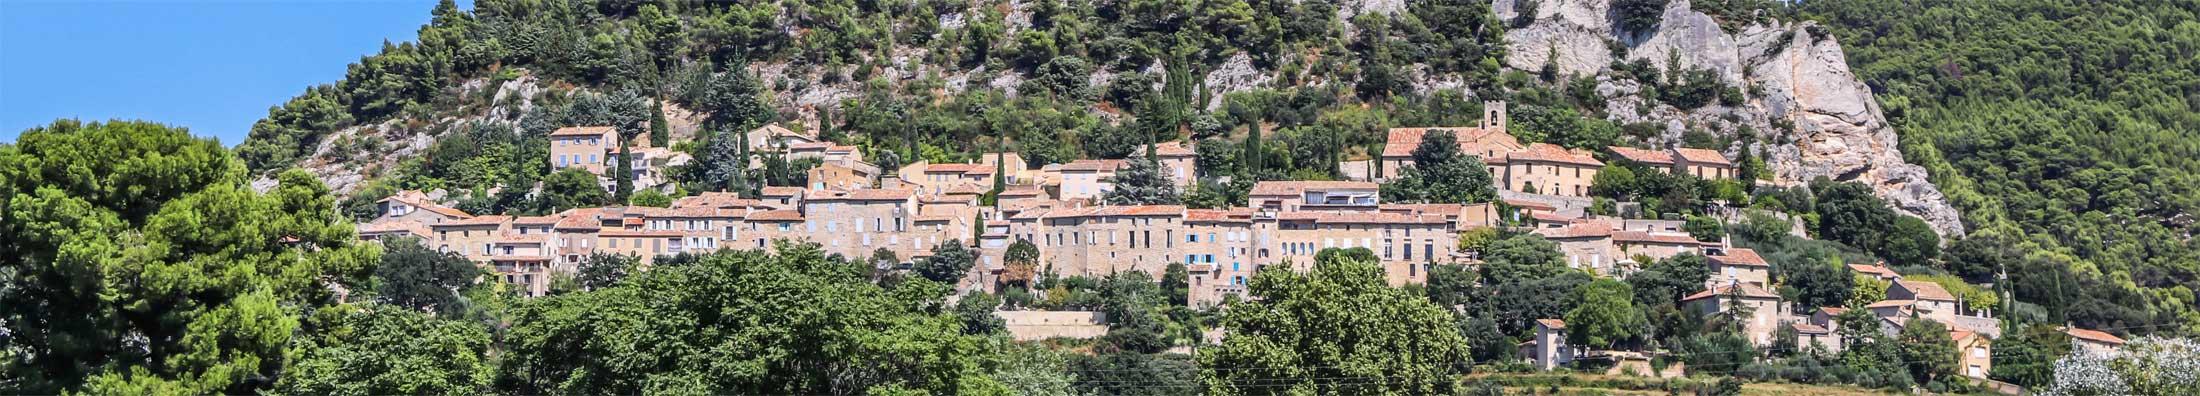 Beste Bed and Breakfast - Frankrijk - Provence - Vaucluse - Le Bouquet de Séguret - topfoto